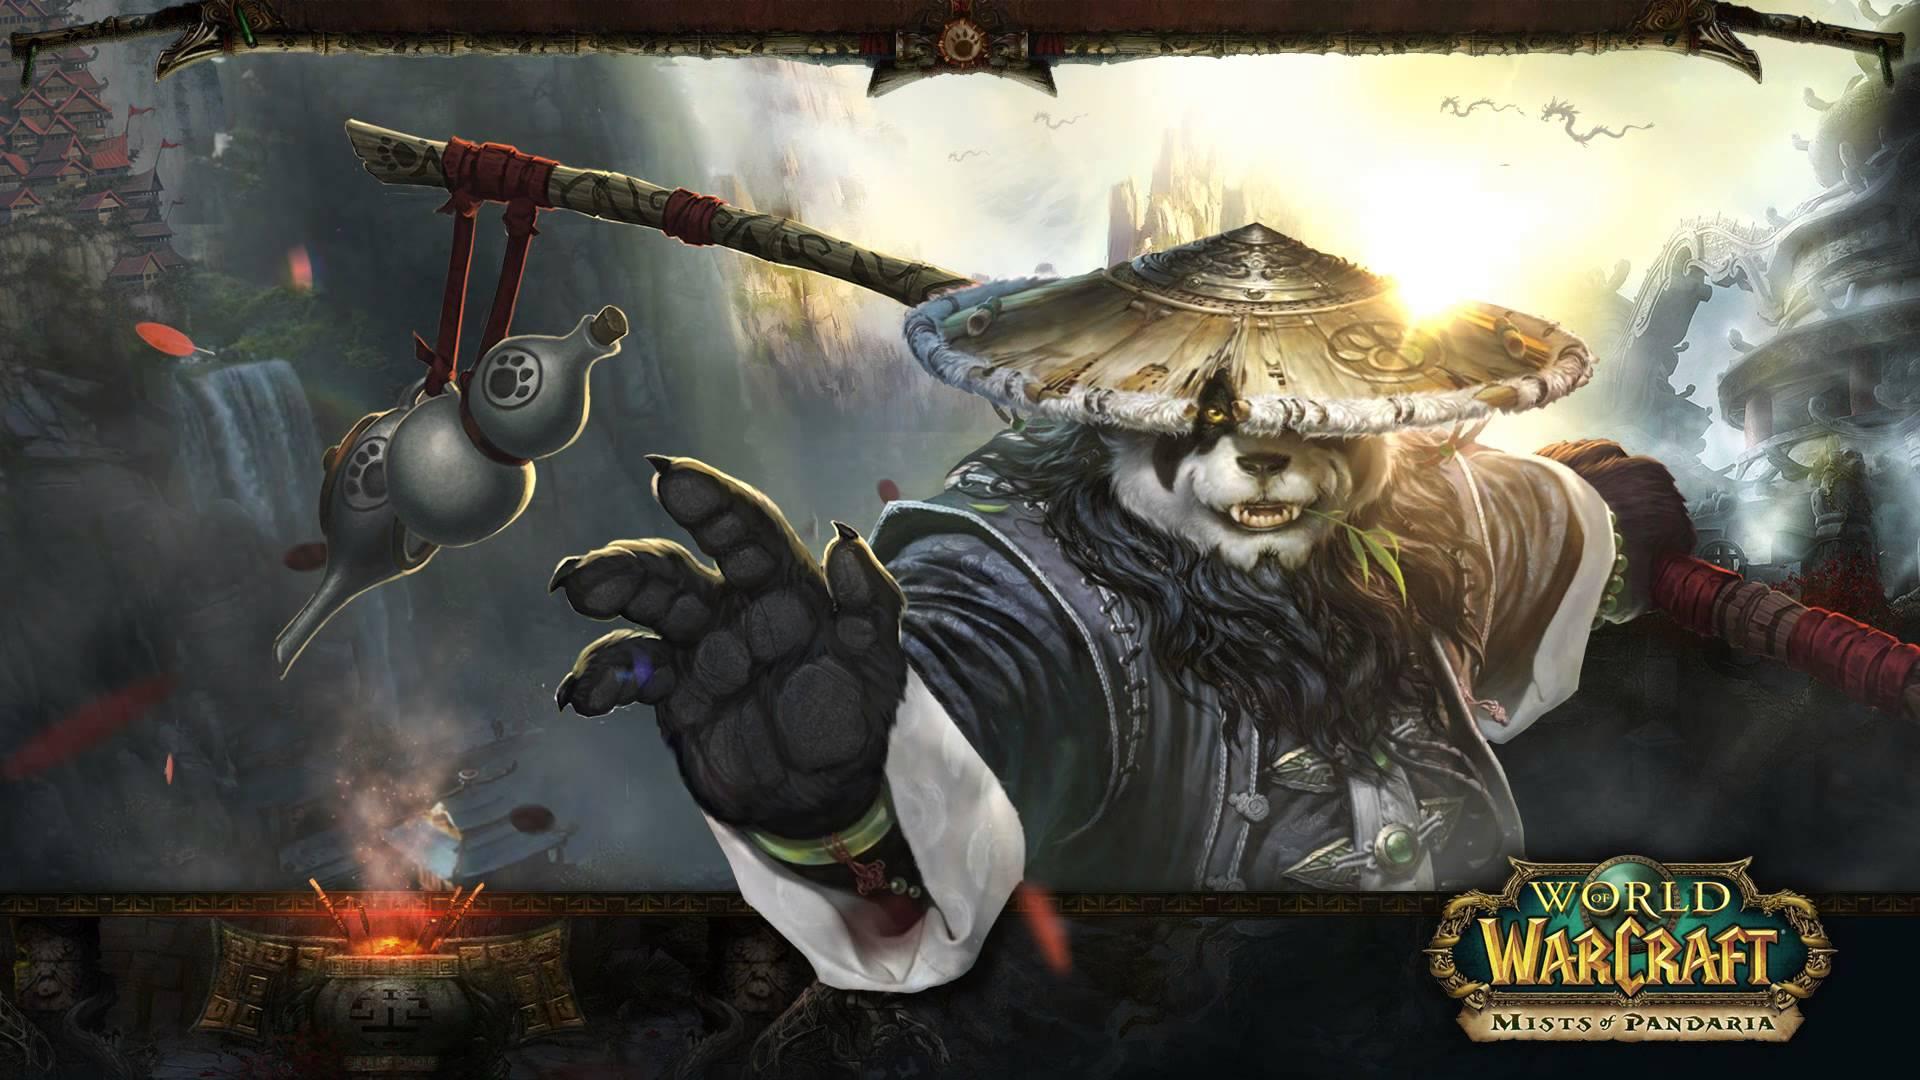 World of Warcraft Chen Stormstout Animated Wallpaper 1920x1080